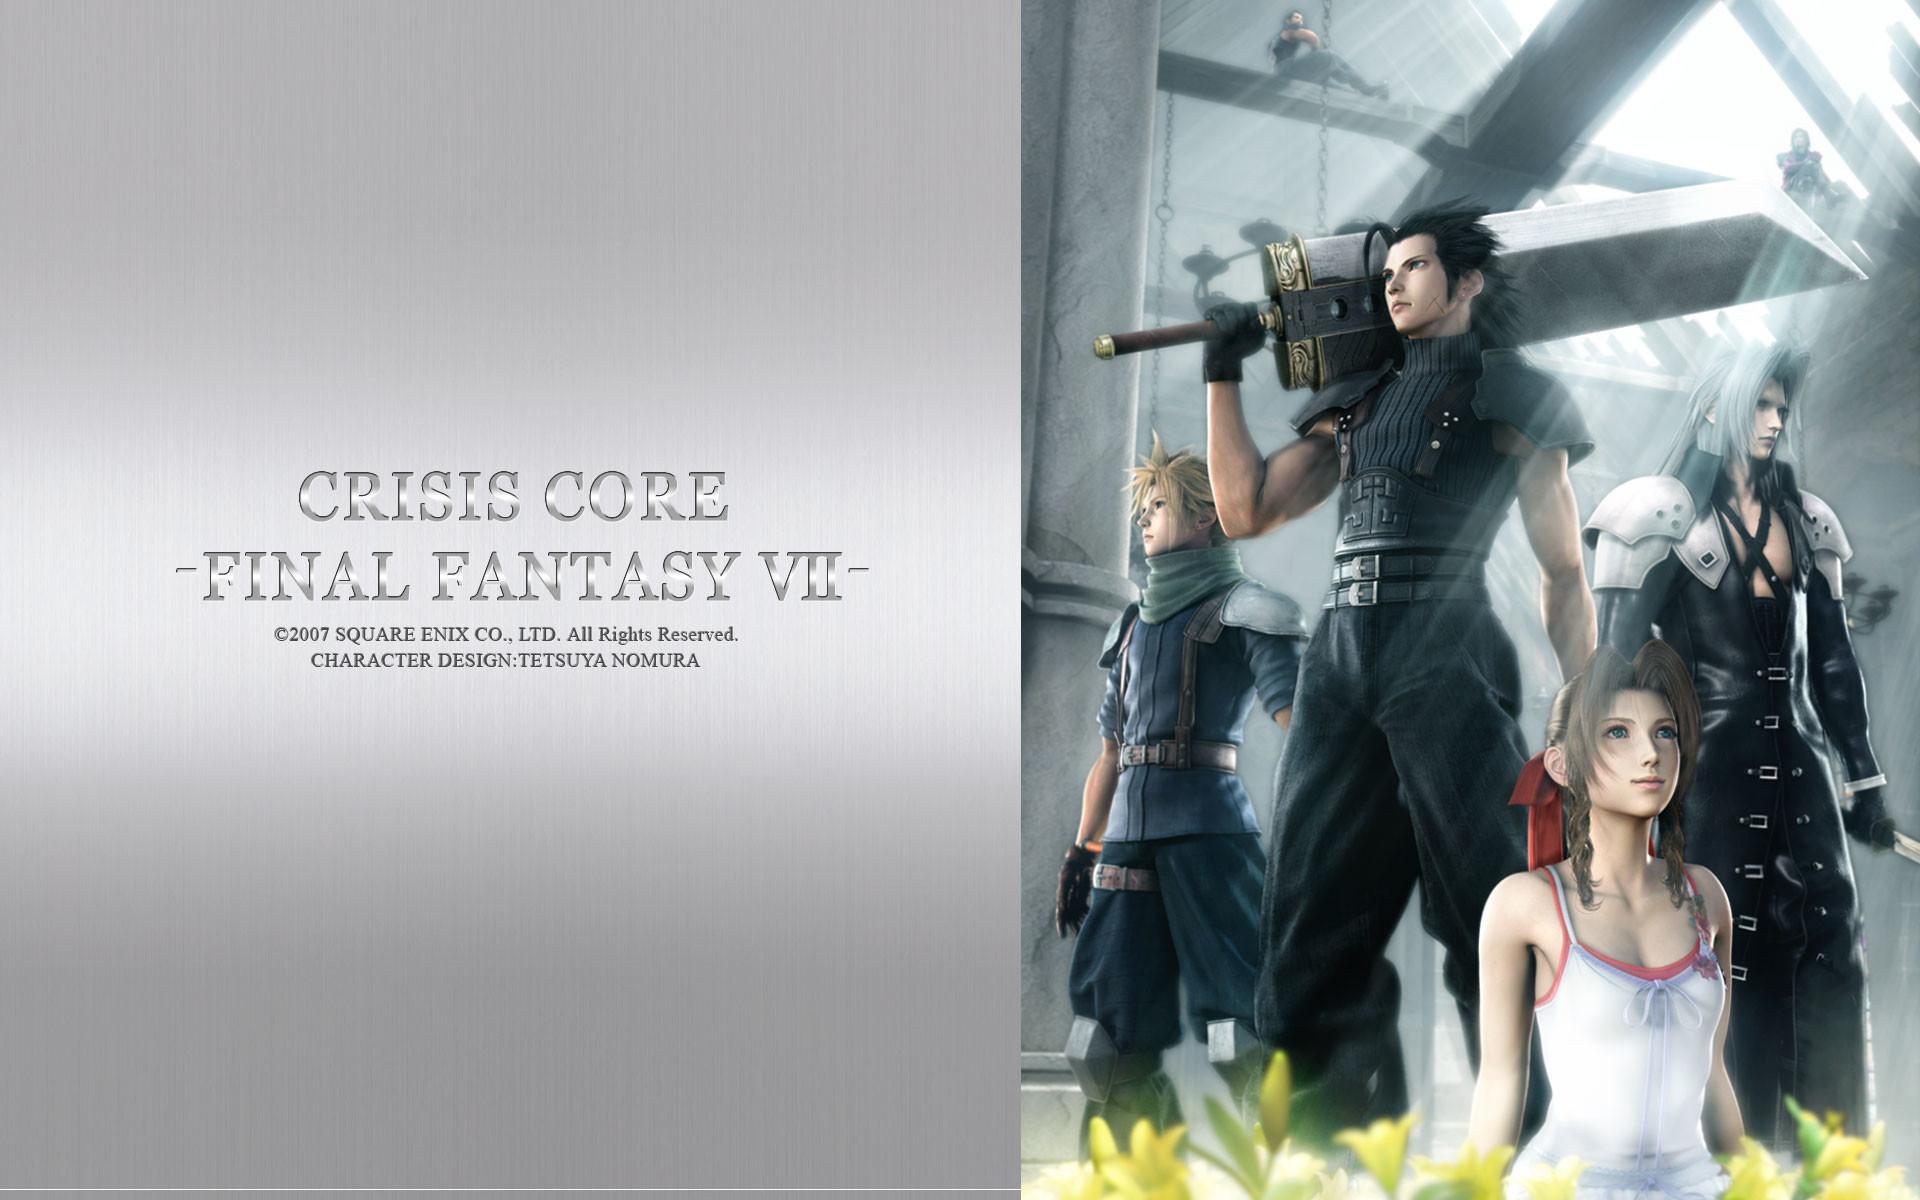 Final fantasy final fantasy vii sephiroth crisis core cloud strife zack  fair aerith gainsborough wallpaper